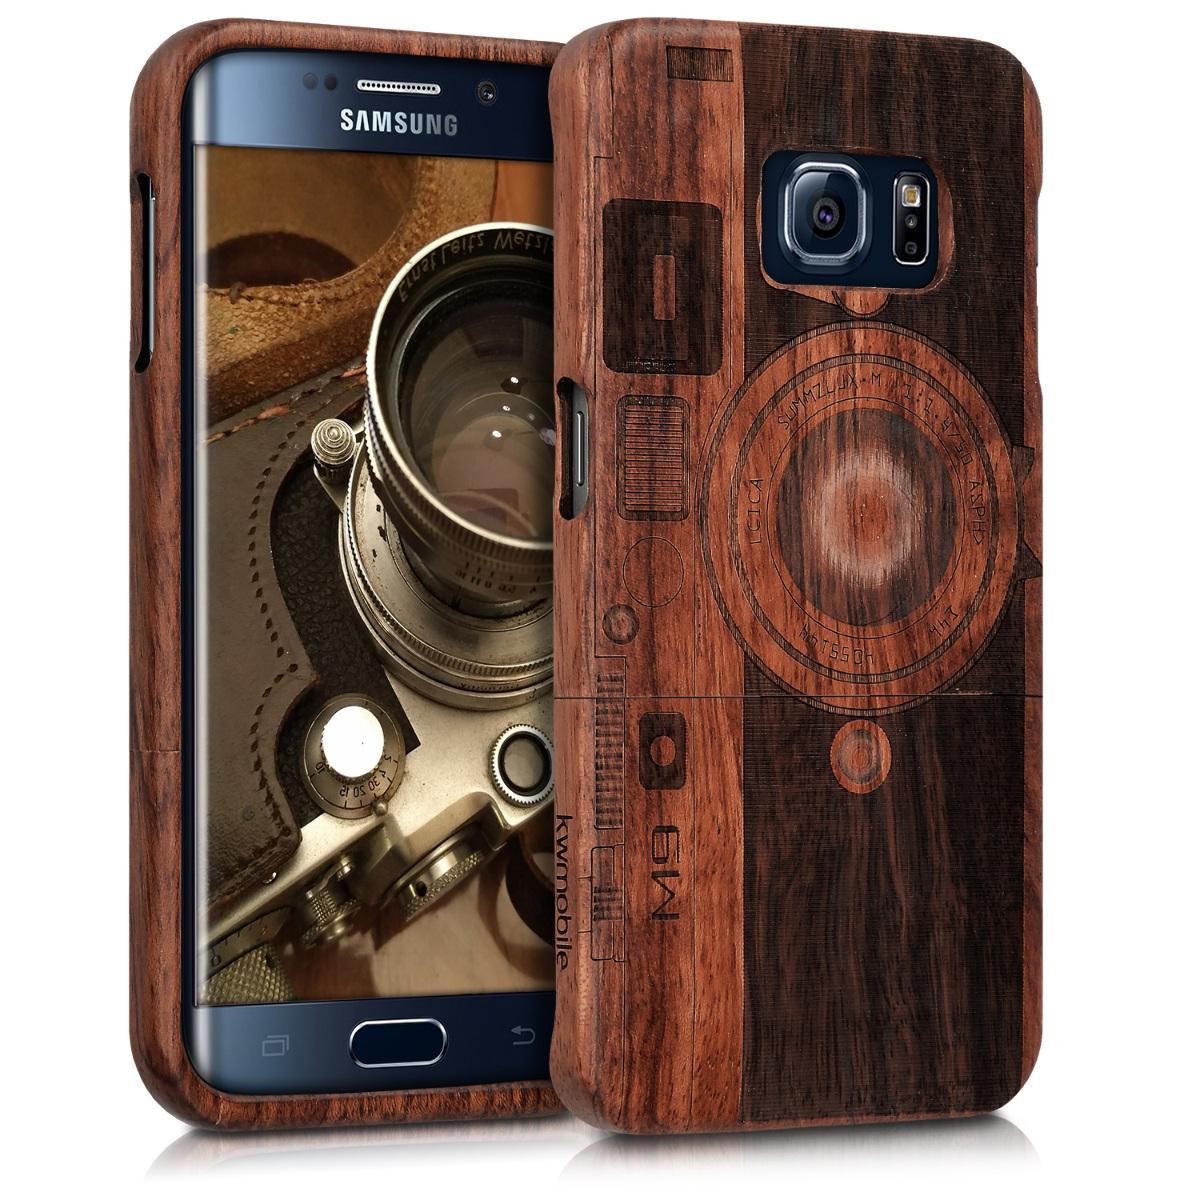 KW Σκληρή Ξύλινη Θήκη - Samsung Galaxy S6 Edge- Dark Brown- ( 38288.03)